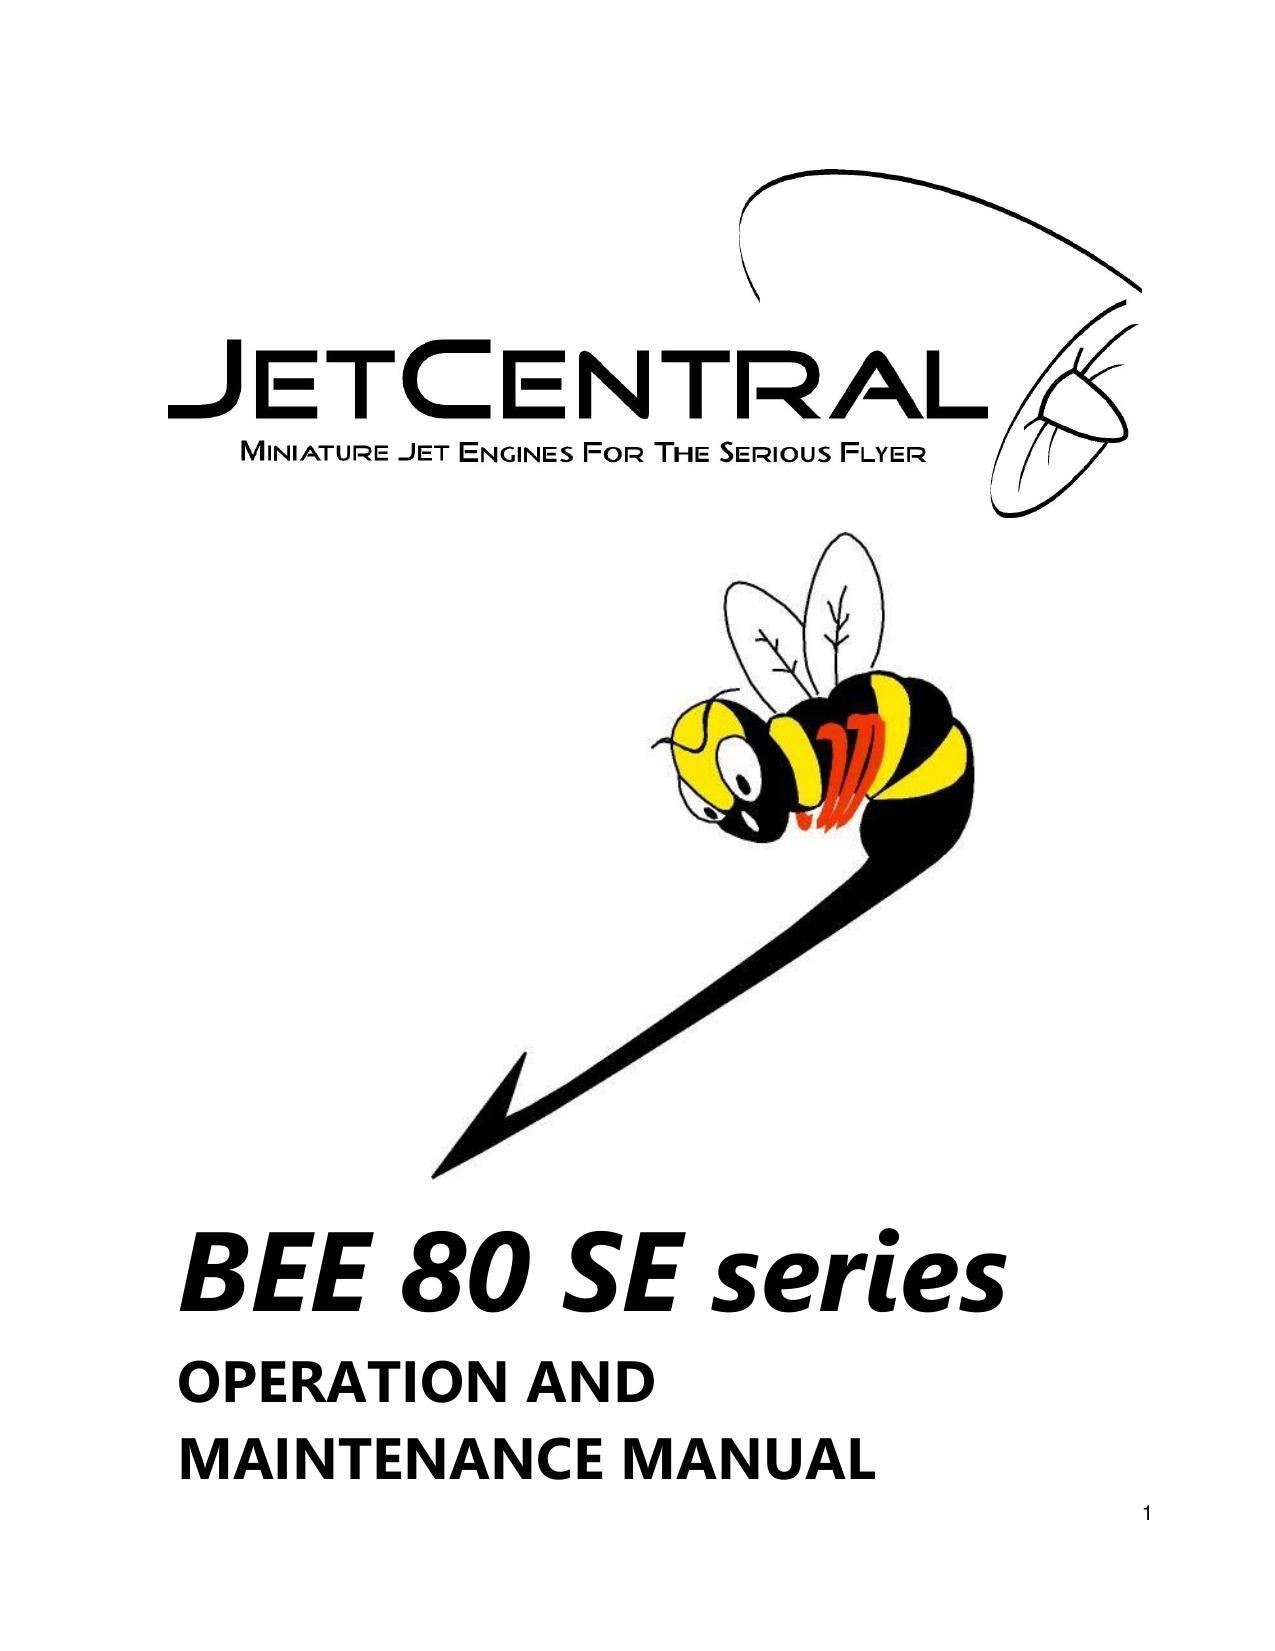 Bee 80 SE Series